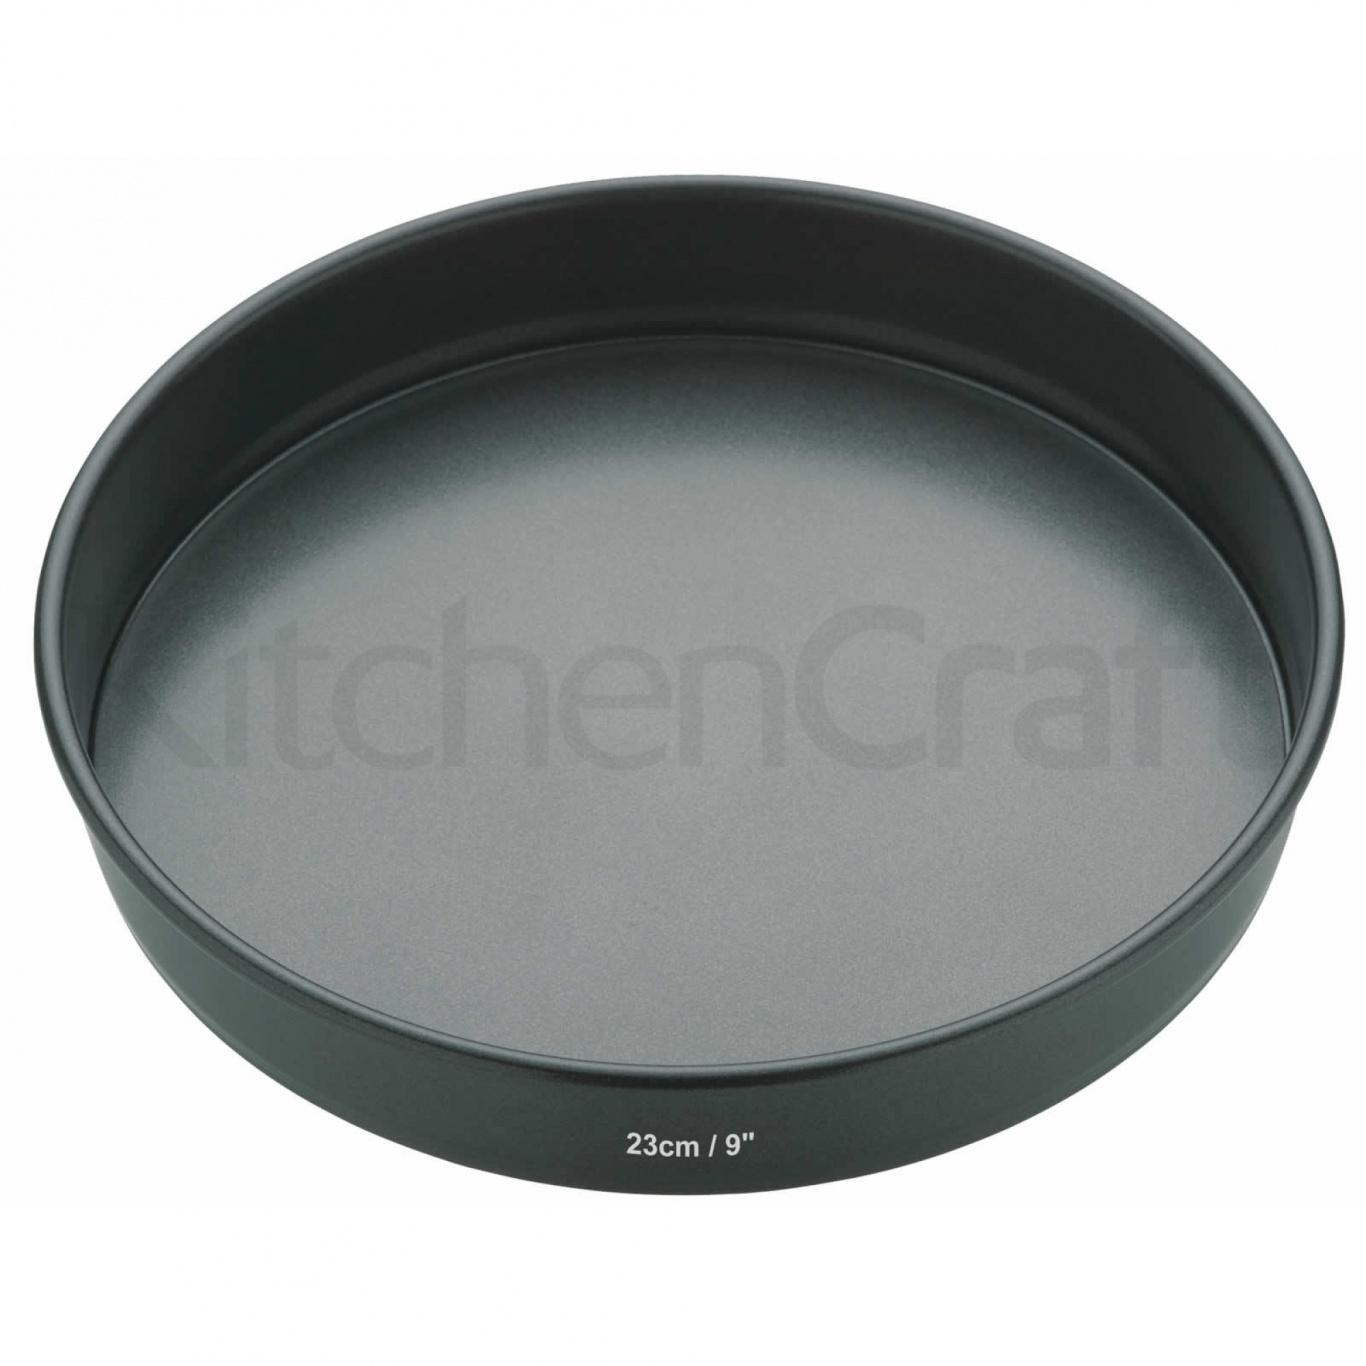 Image of Non Stick Round Sandwich Pan 23cm/9ins